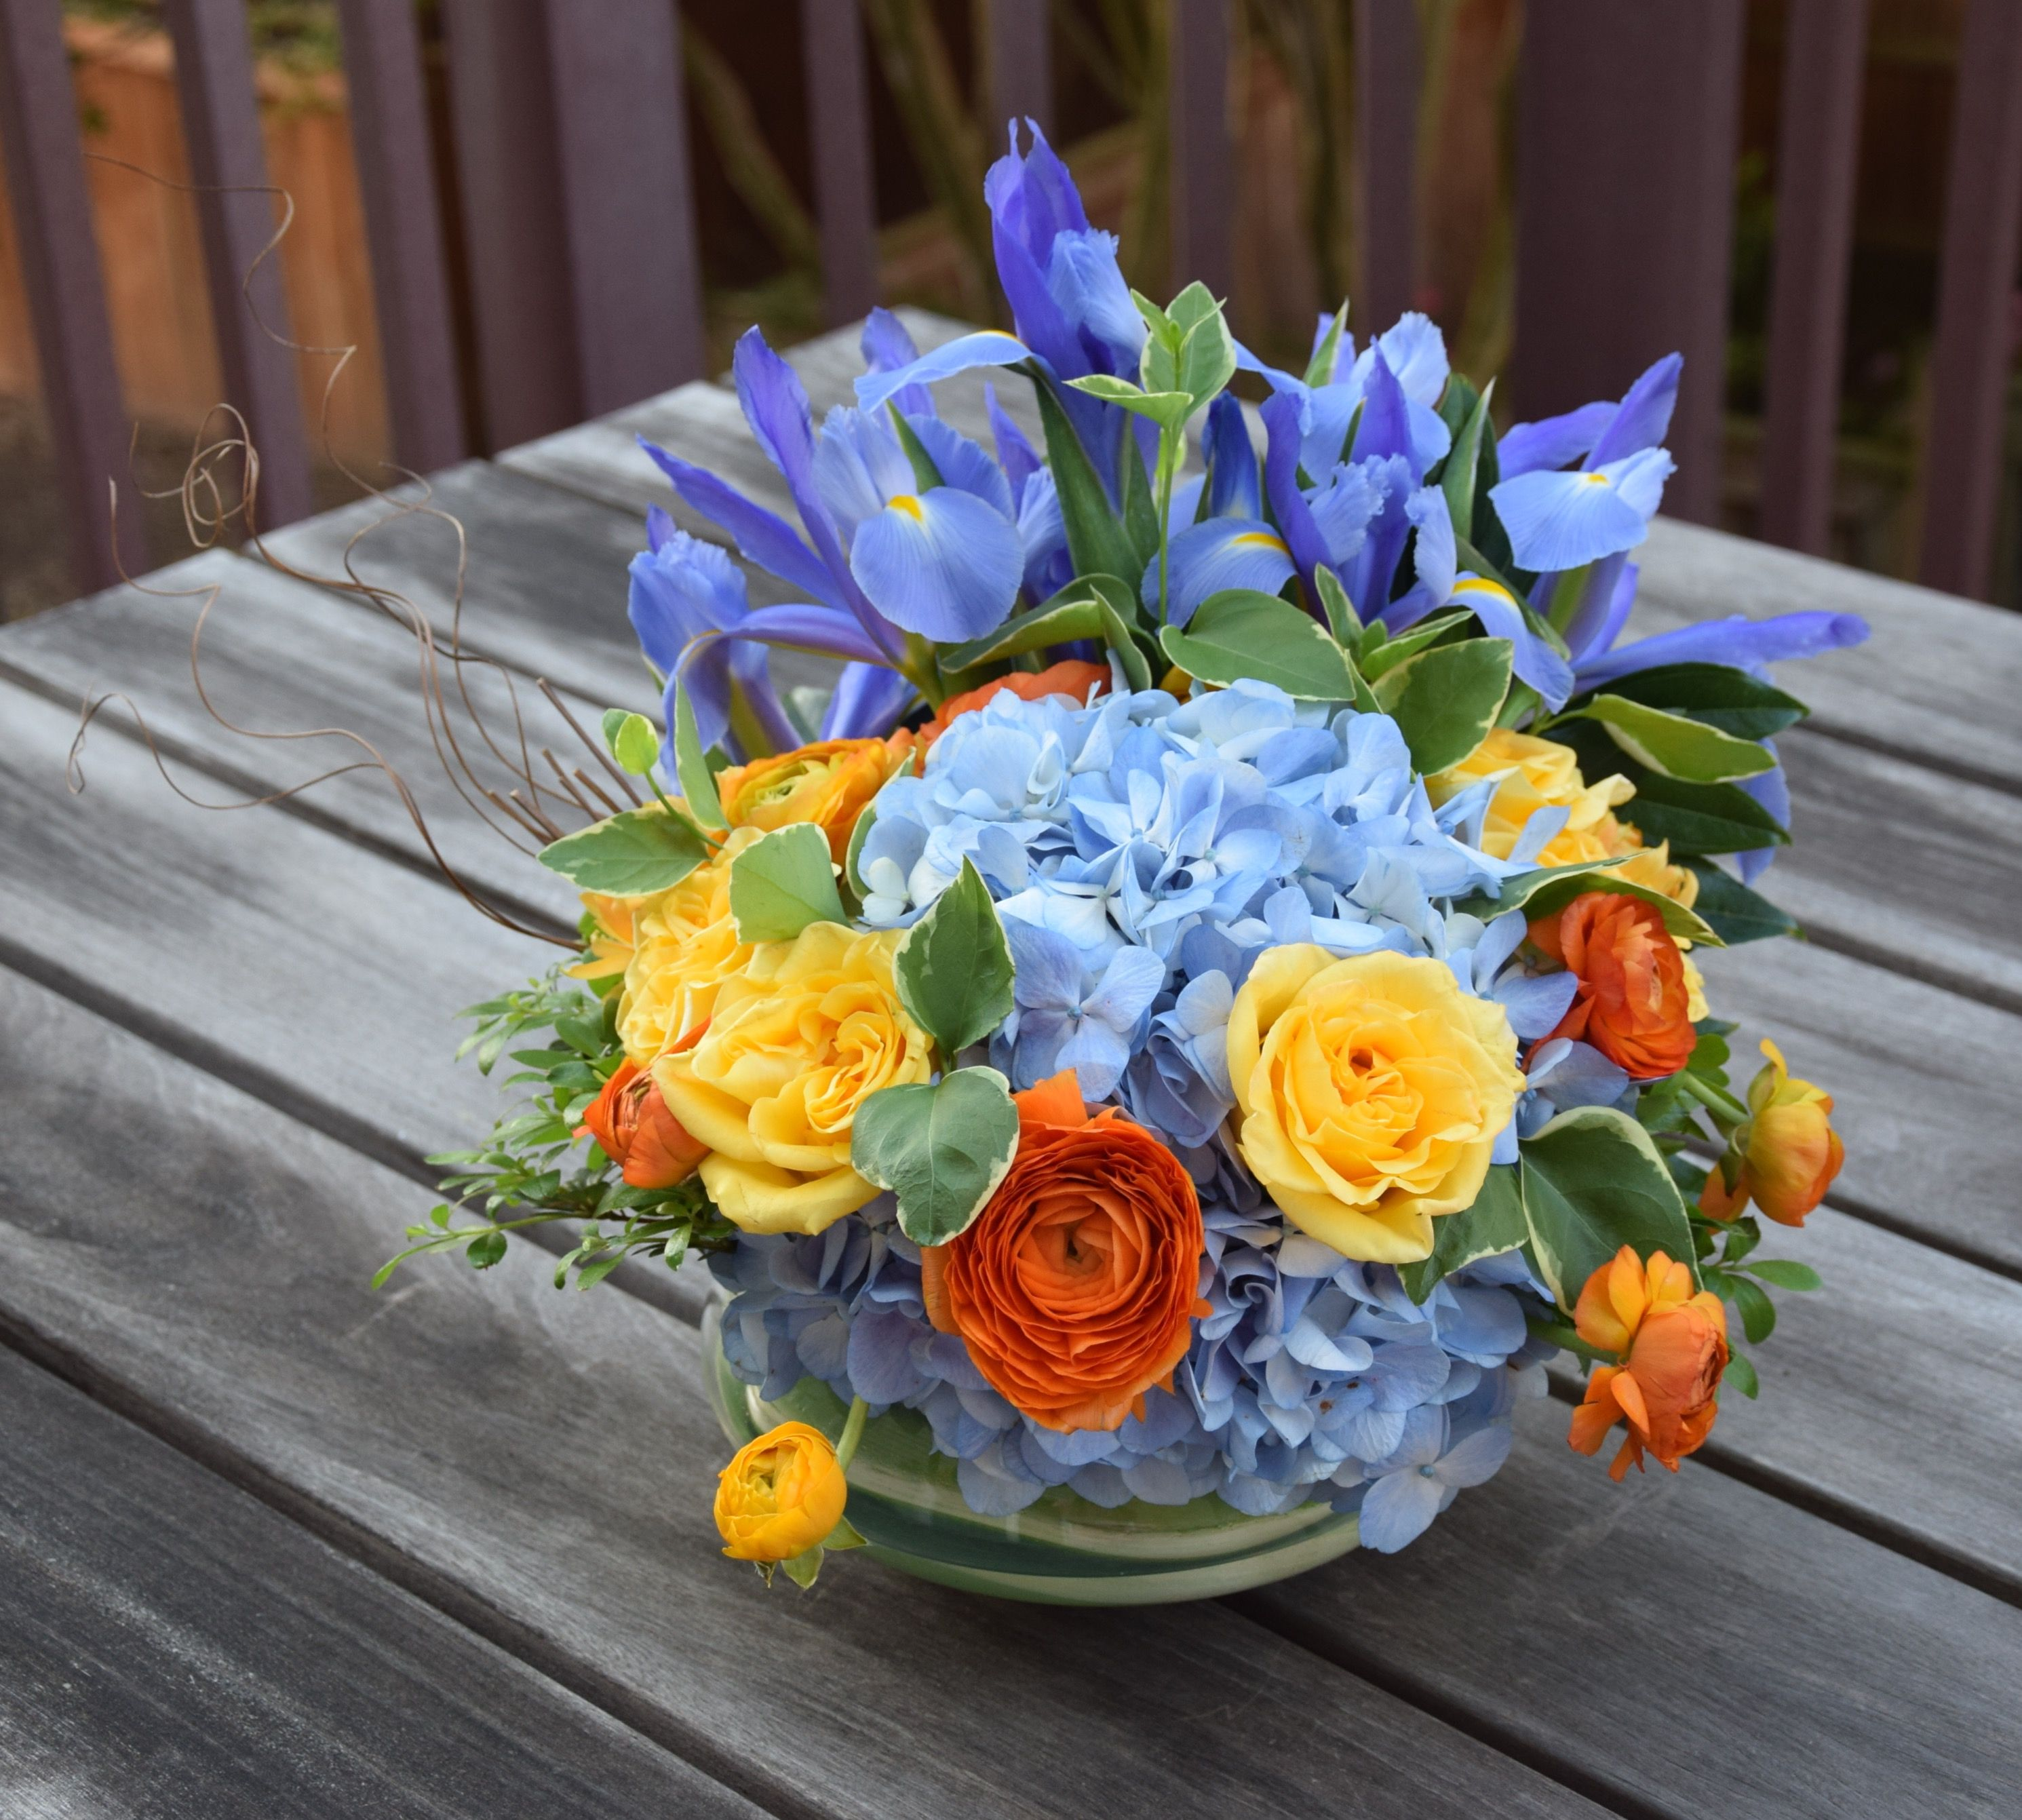 Flower Arrangement In A Bowl Blue Hydrangeas Yellow Roses Orange Ranunculus Blue Ir Rose Flower Arrangements Fresh Flowers Arrangements Yellow Rose Flower